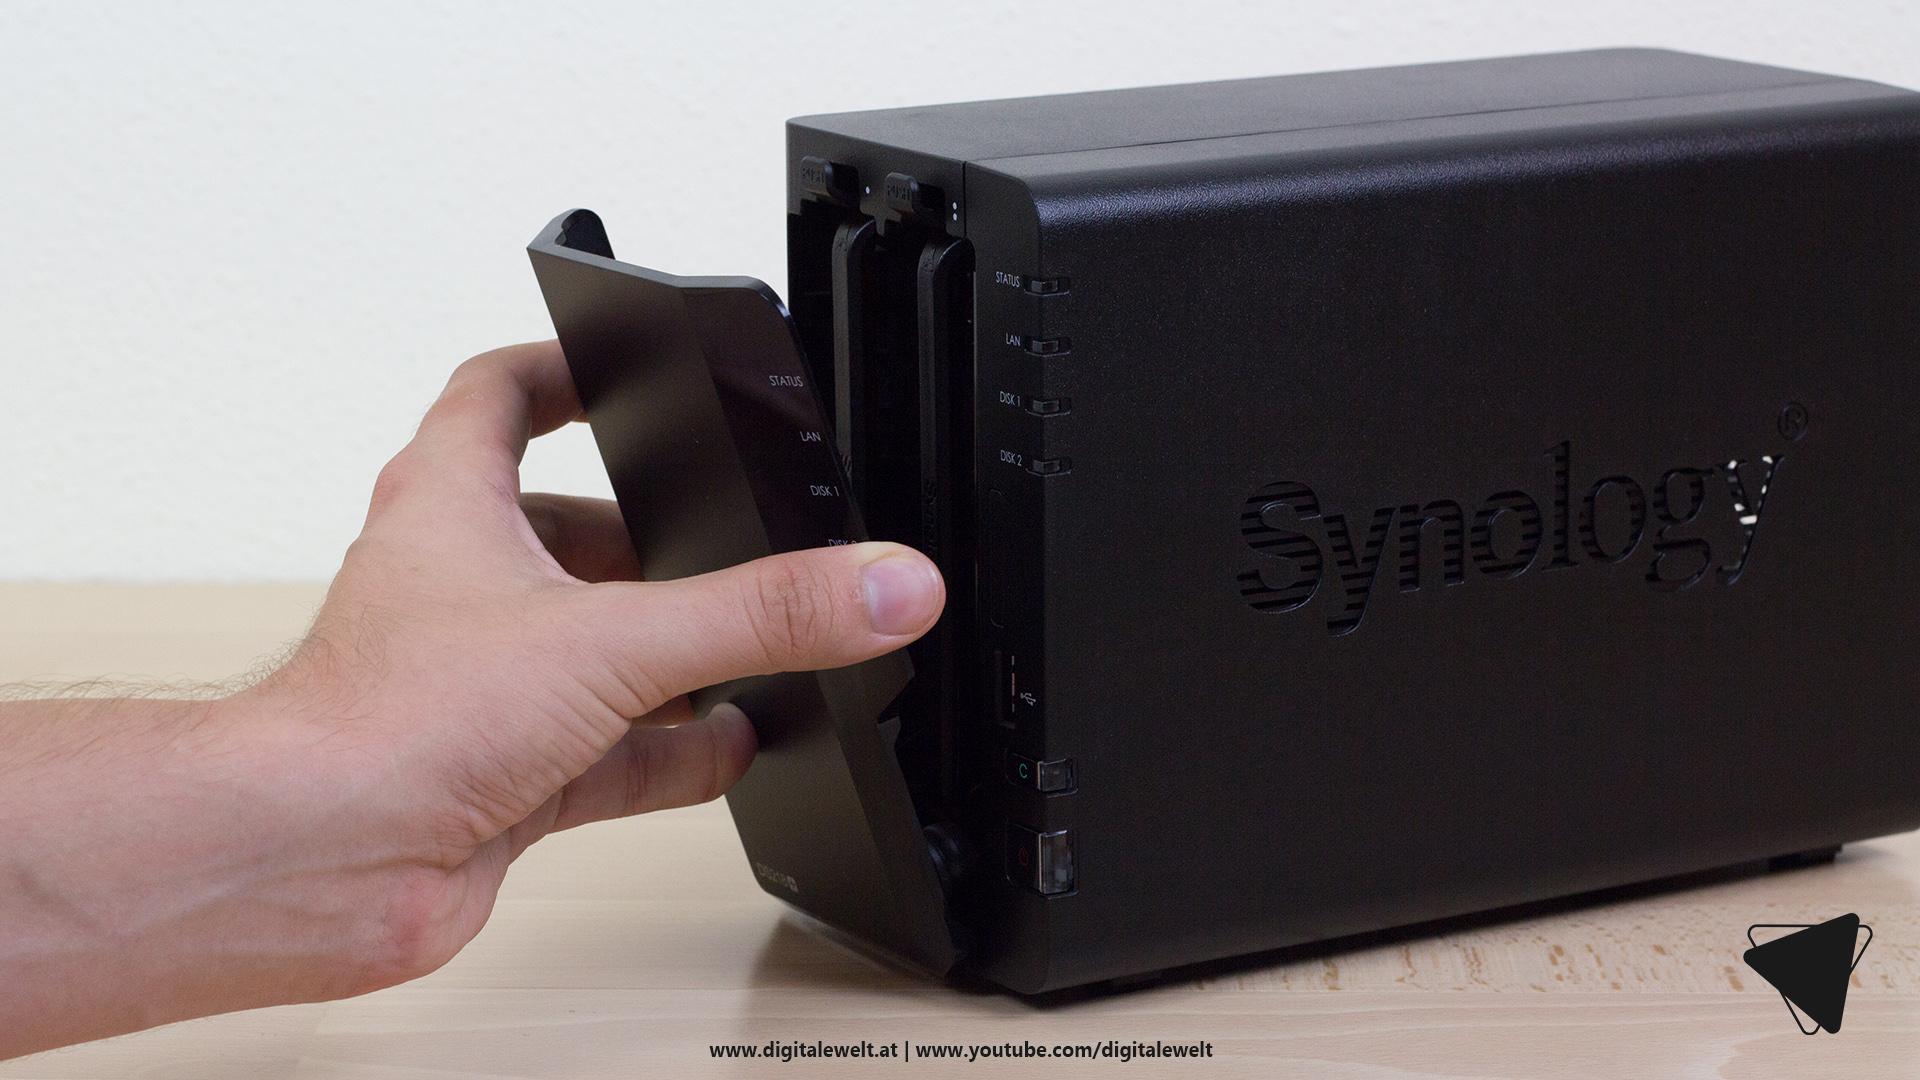 Synology DS218+ NAS - Abdeckung anbringen